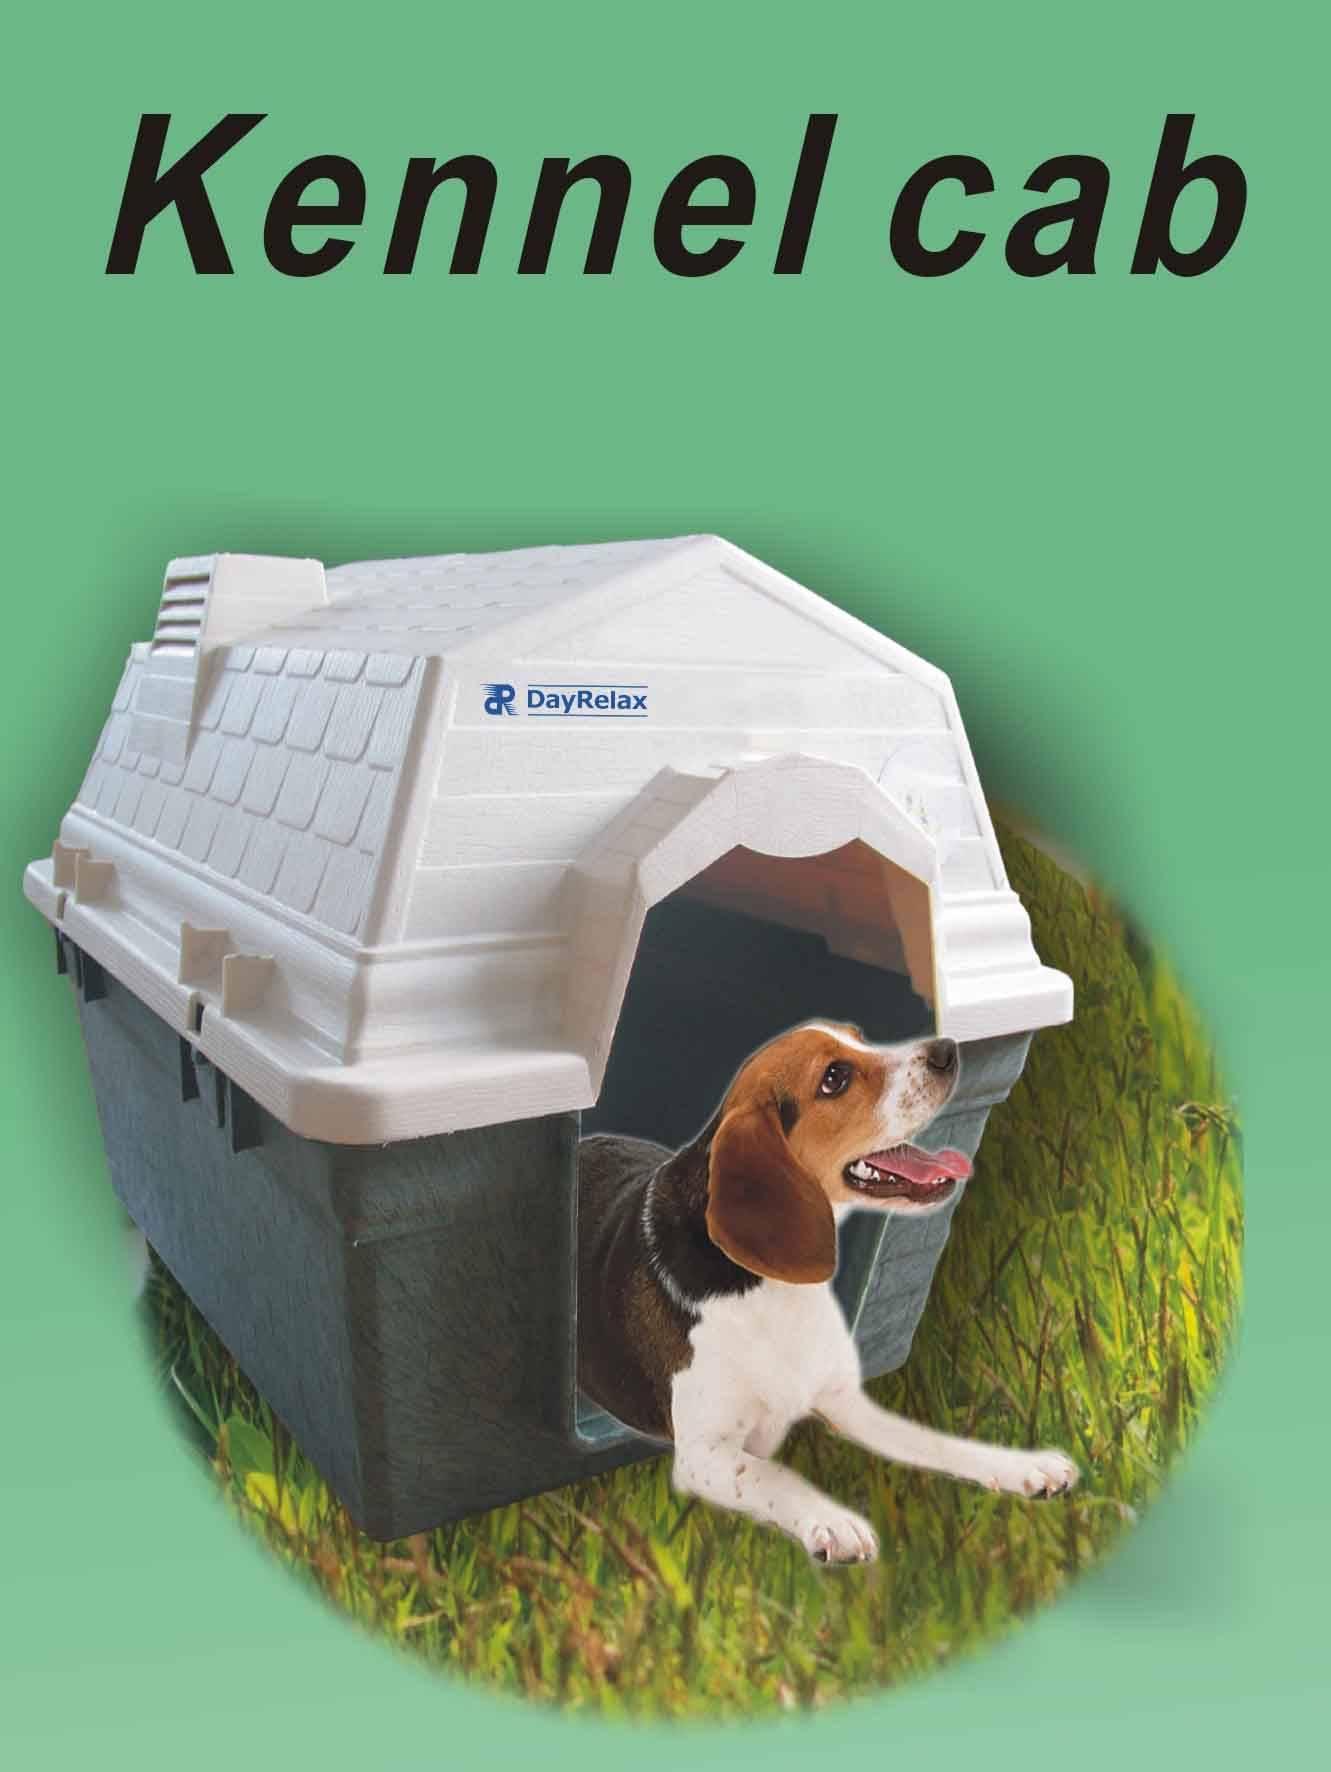 Kennel Cab(Dog house)